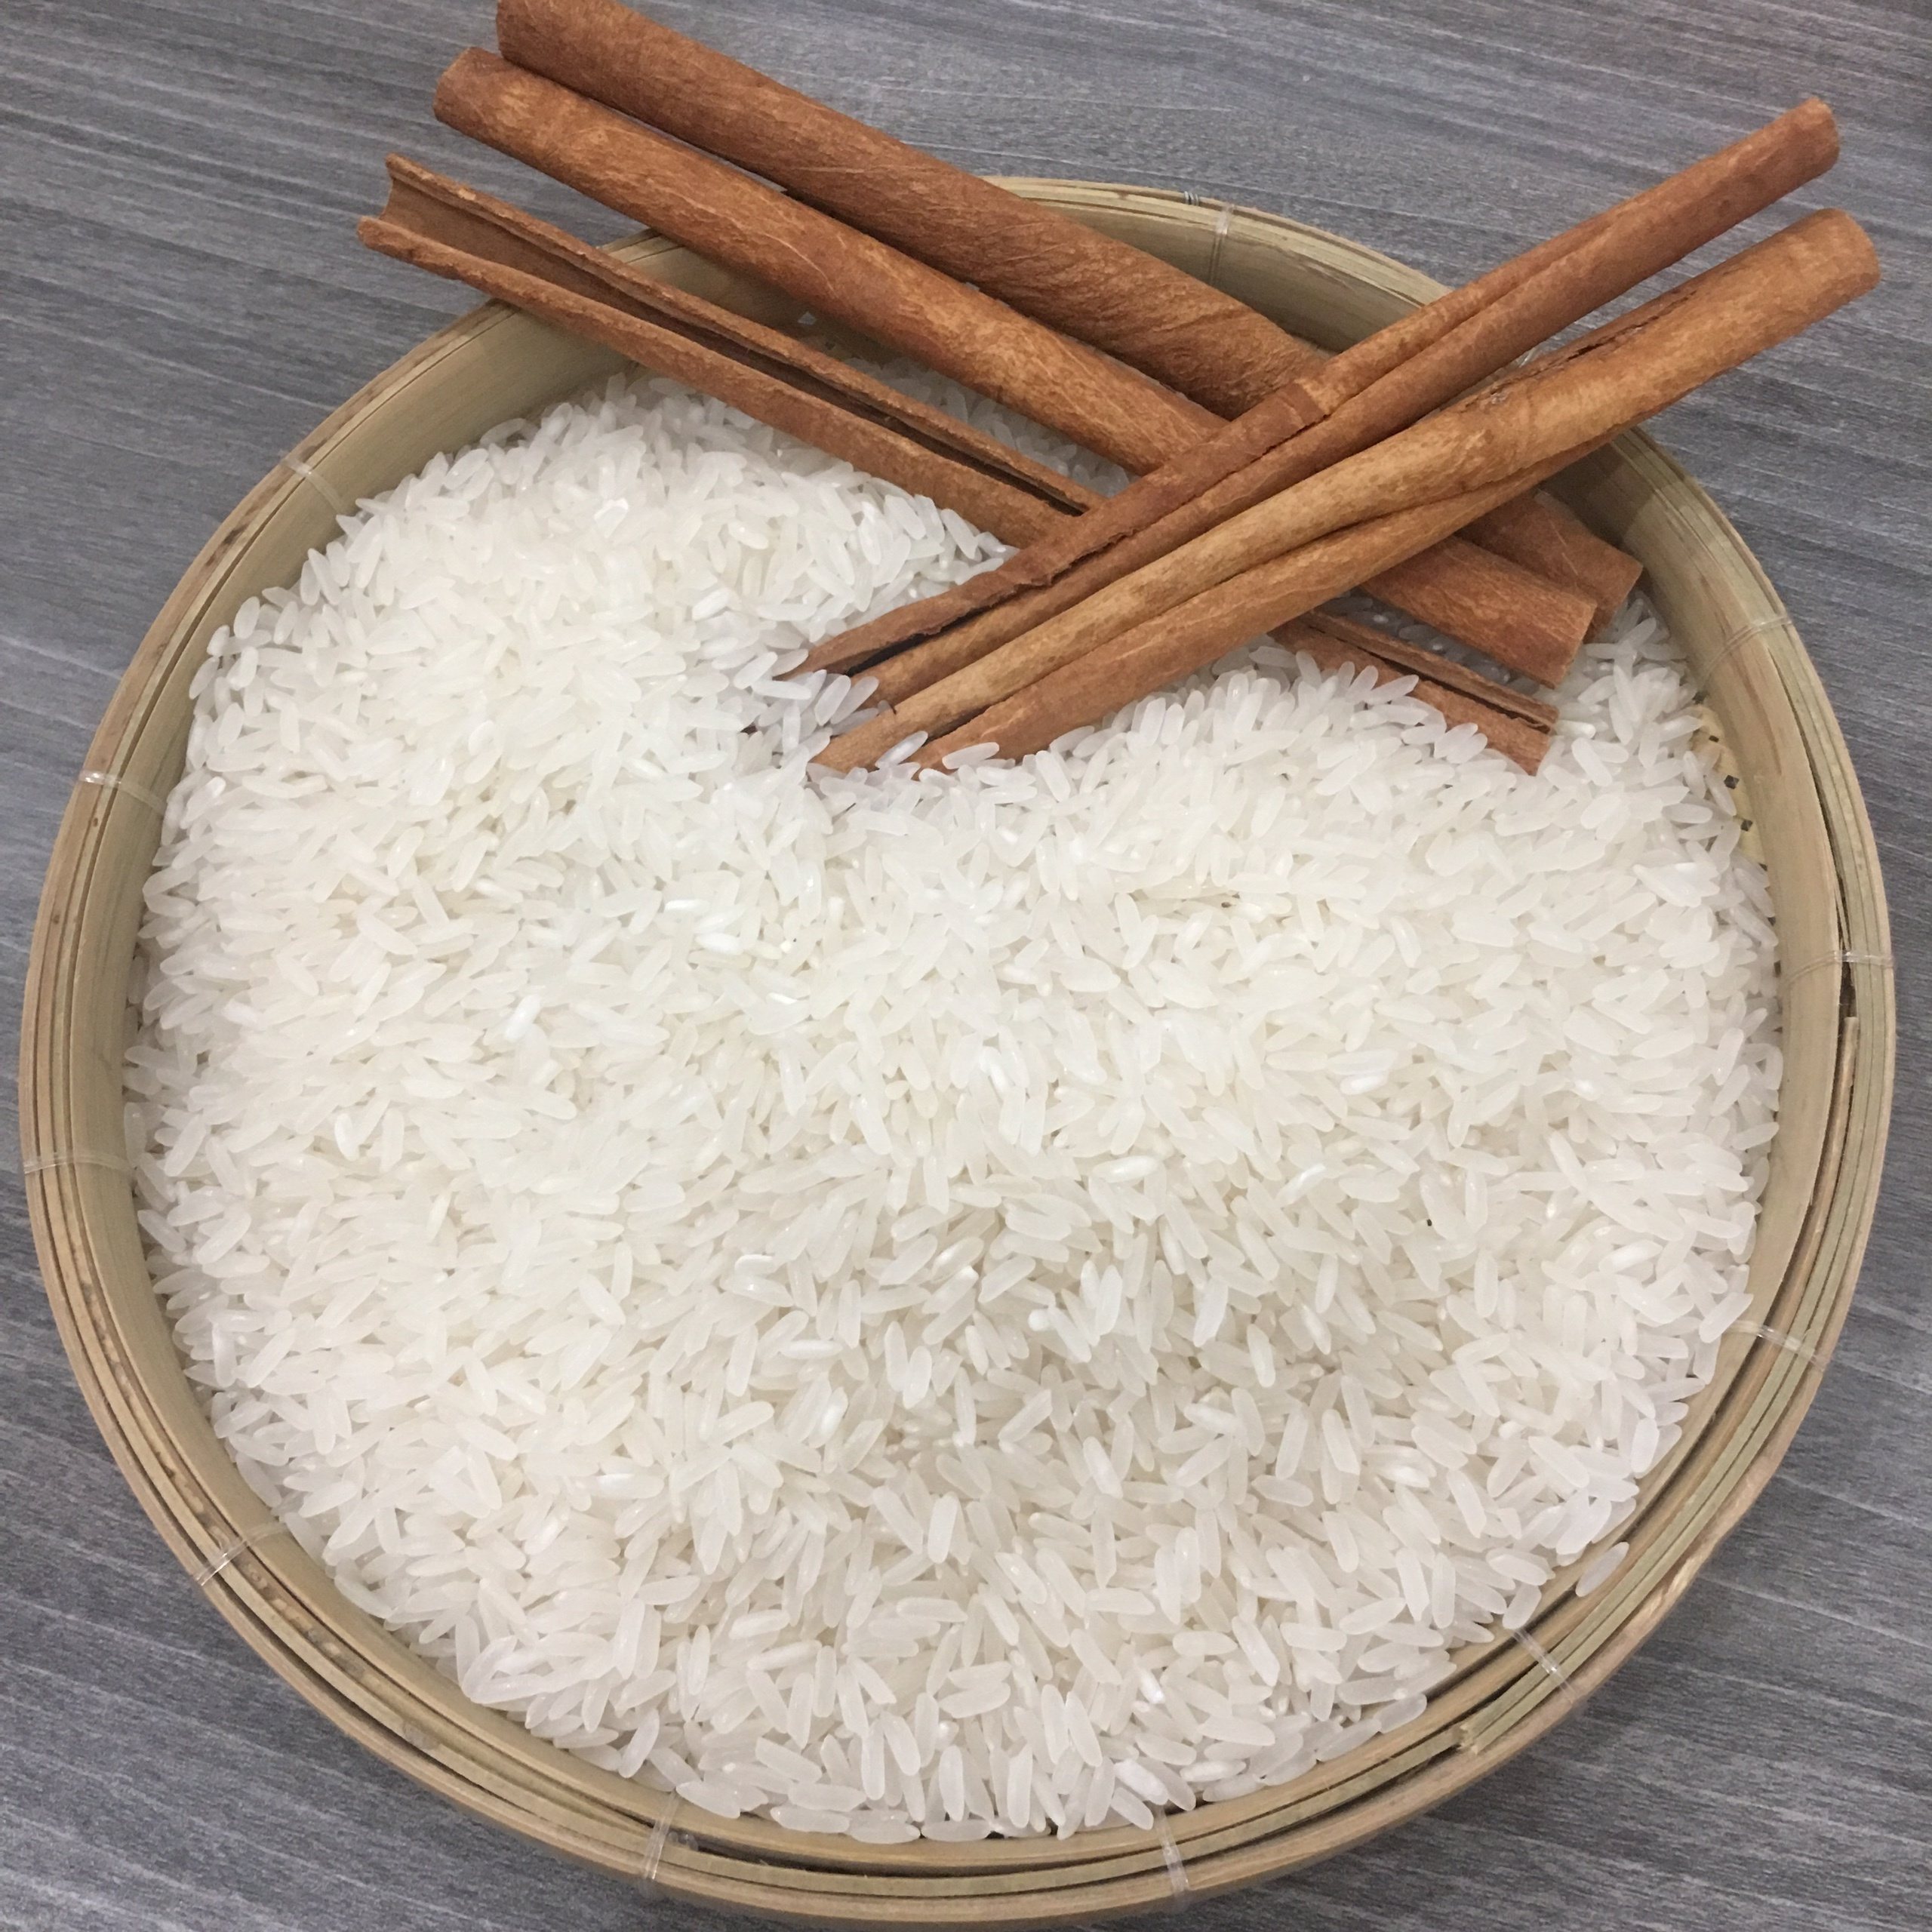 Premium Quality Thai Hom Mali Jasmine Rice Brand Ms Sapphire